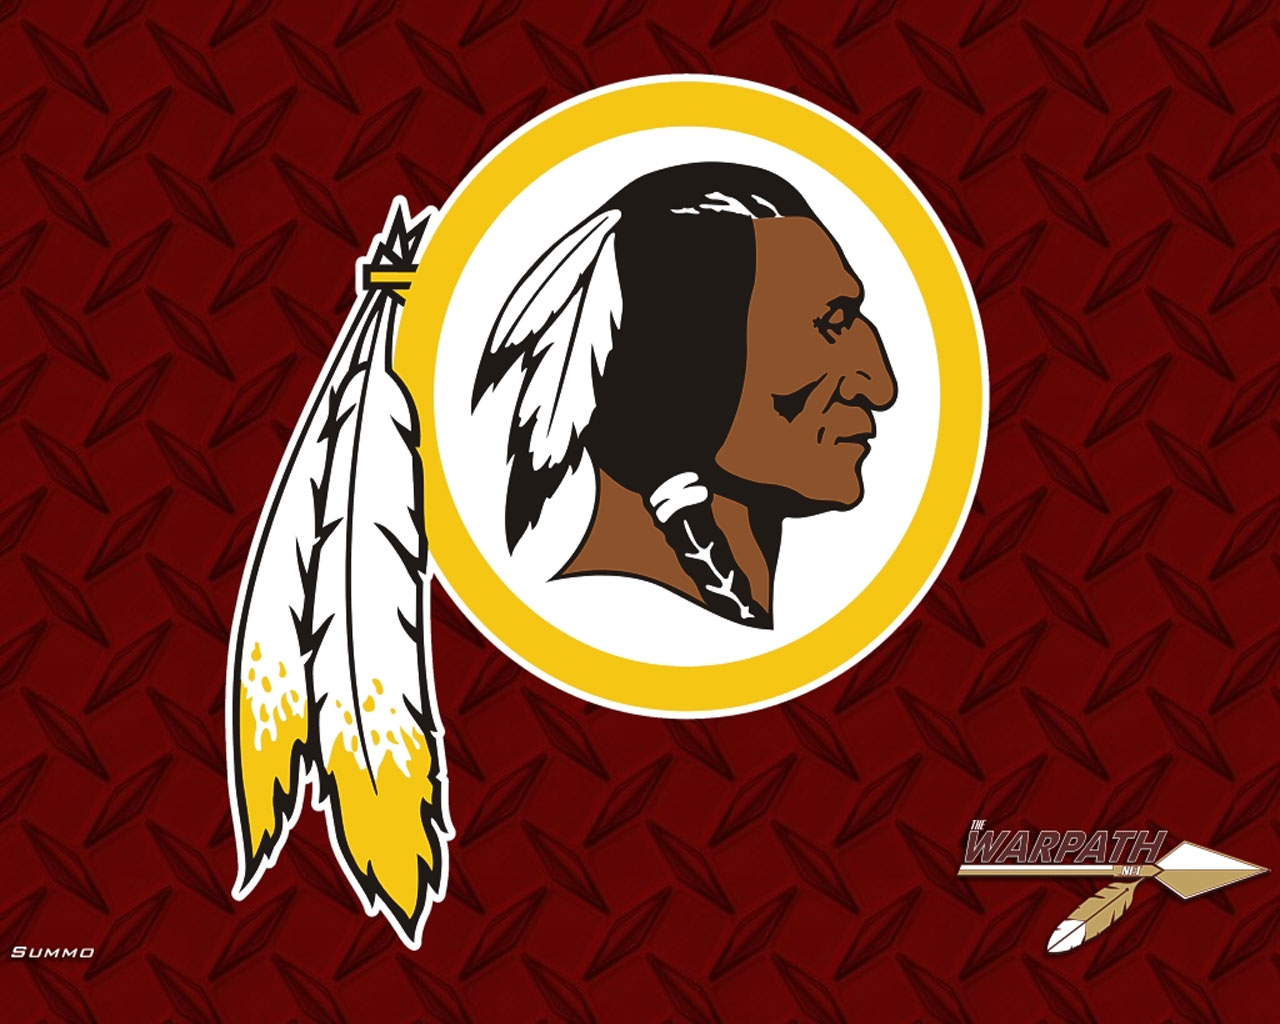 Washington Redskins wallpaper Fondos de pantalla de Washington 1280x1024